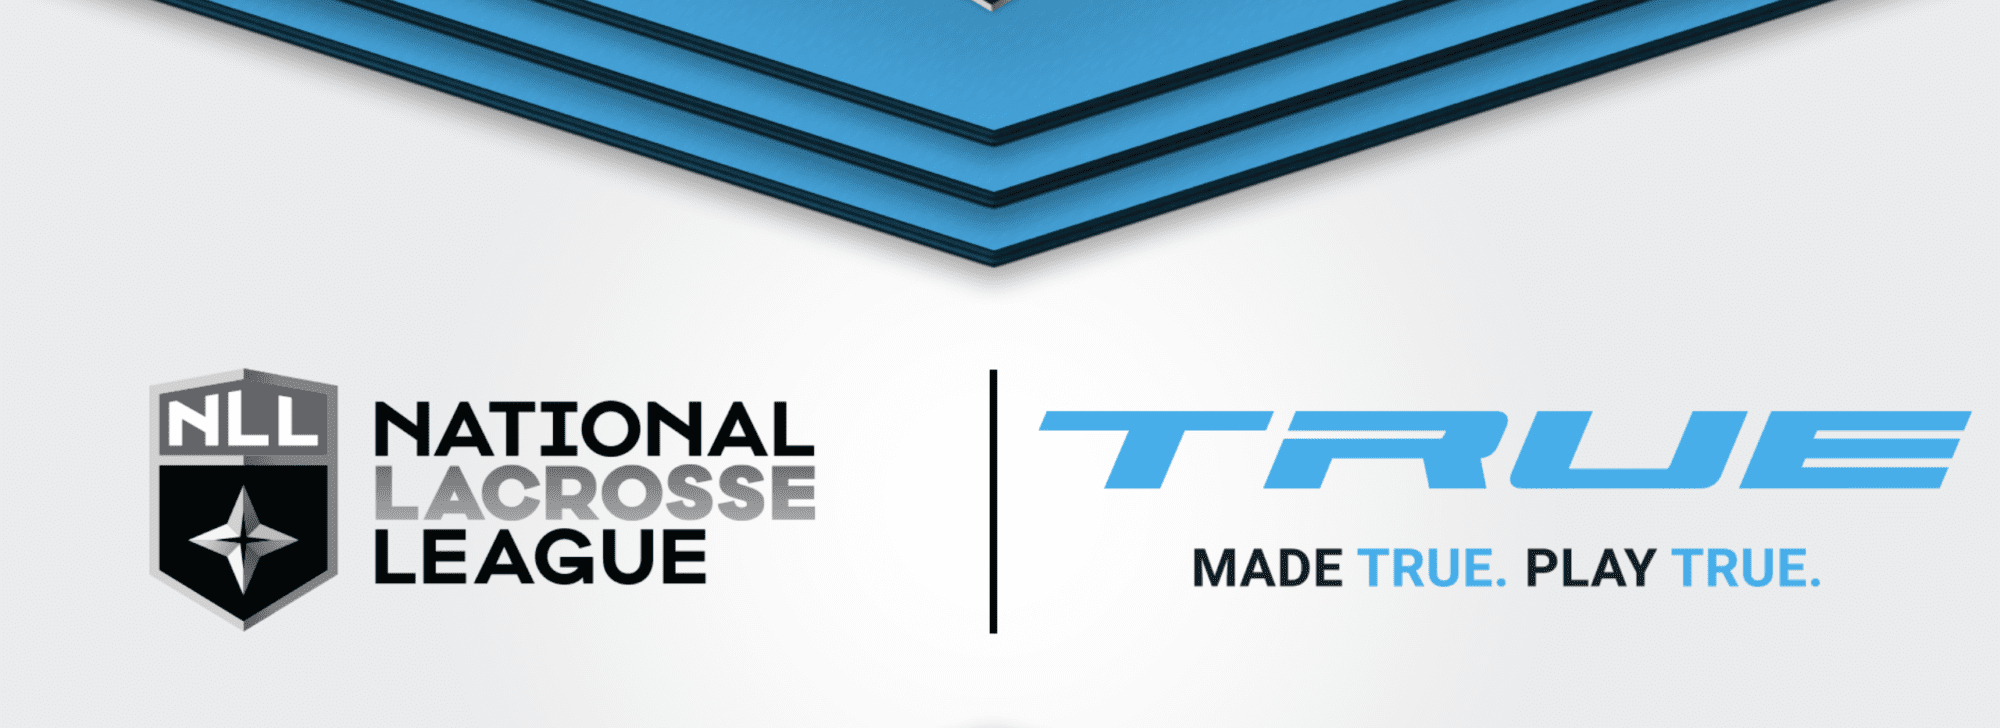 nll national lacrosse league true sports